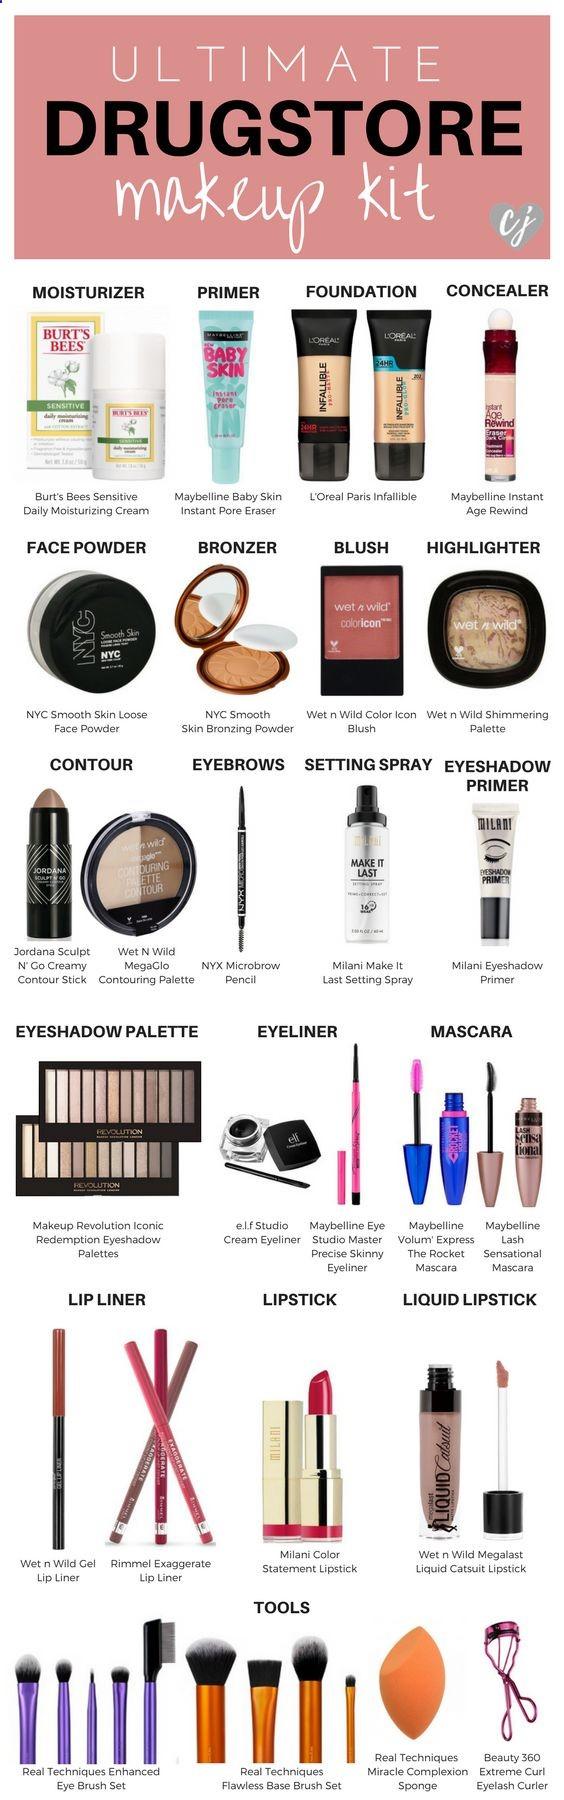 Pin by cheyenne on Eye Makeup Makeup, Drugstore makeup